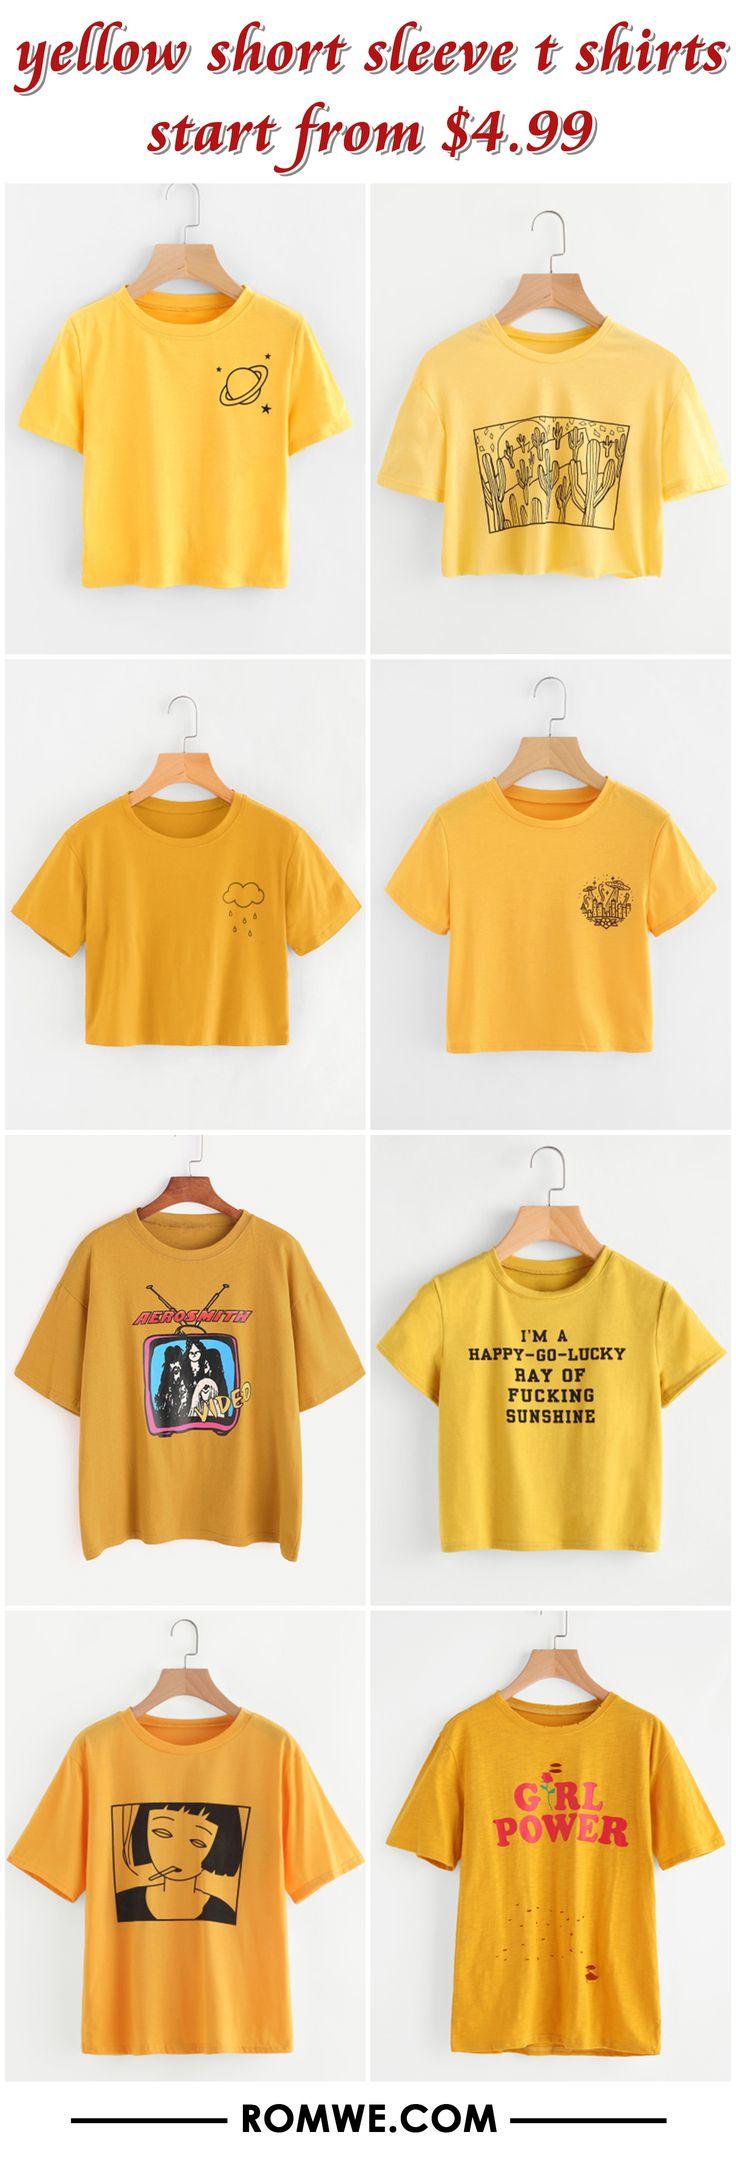 young yellow t shirts 2017 - romwe.com